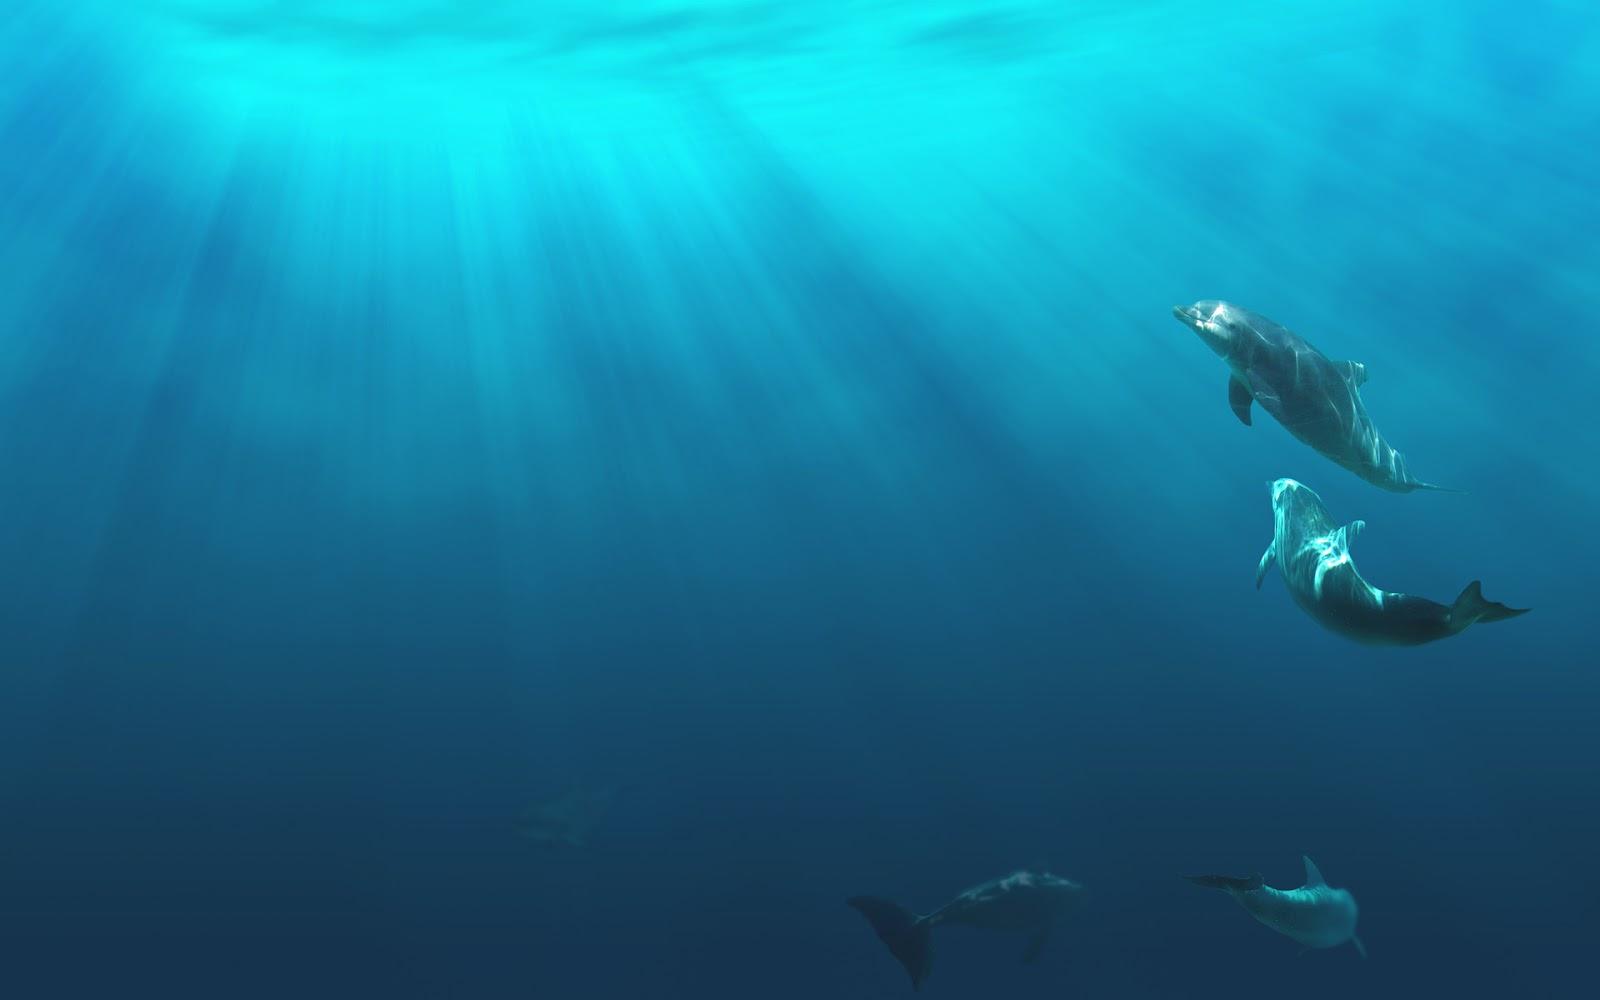 200 <b>Dolphin</b> HD <b>Wallpapers</b> | Backgrounds - <b>Wallpaper</b> Abyss